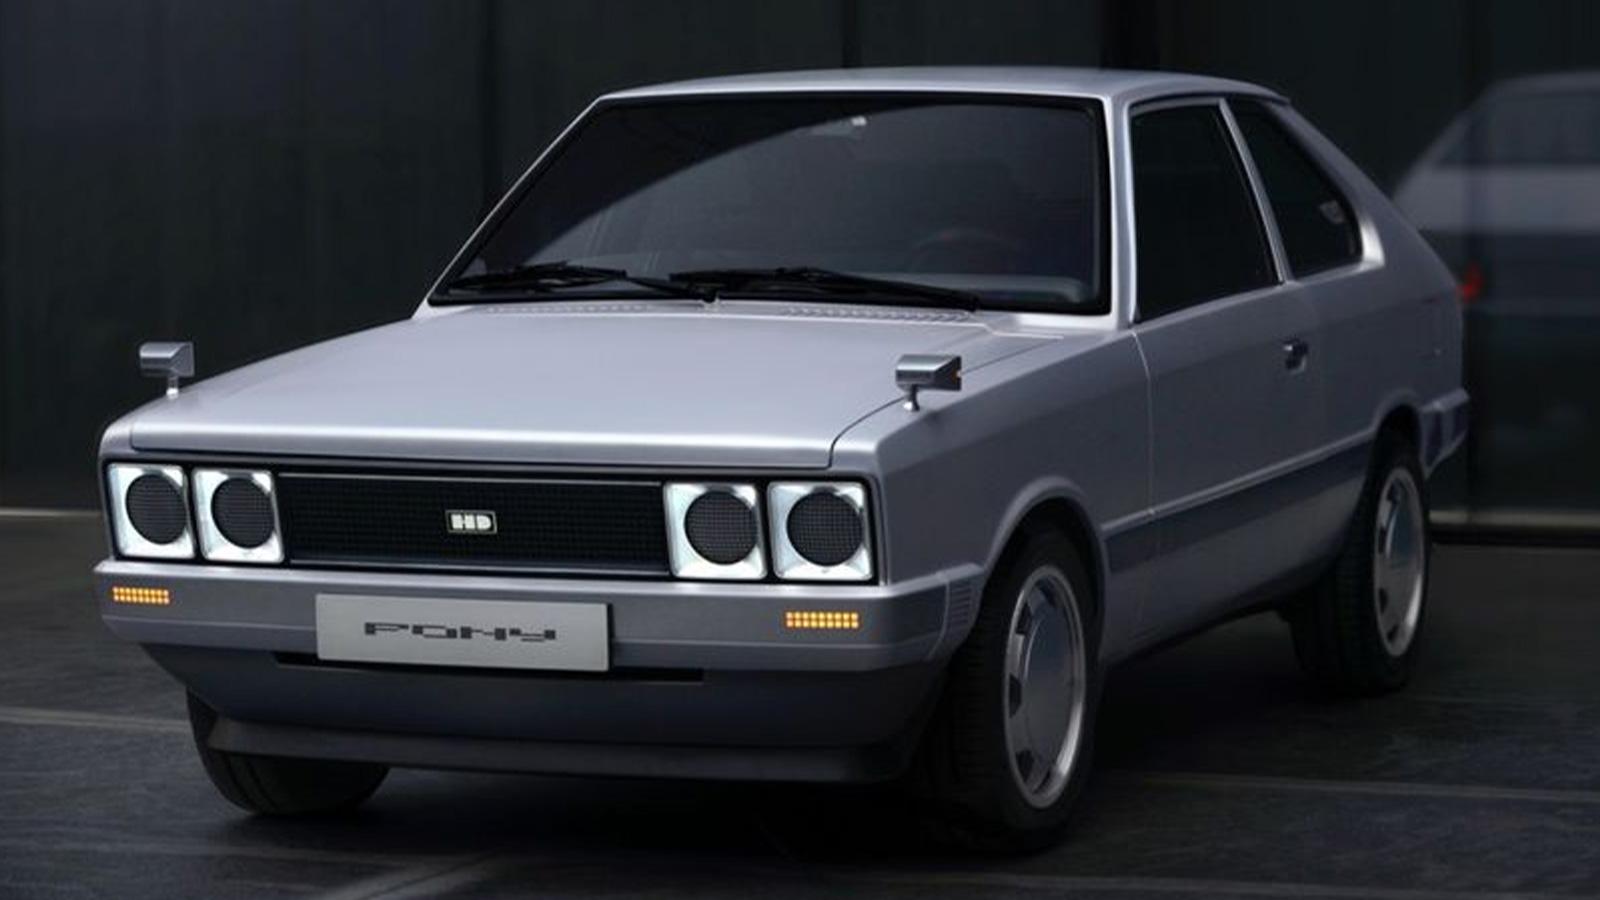 HyundaiPony EV